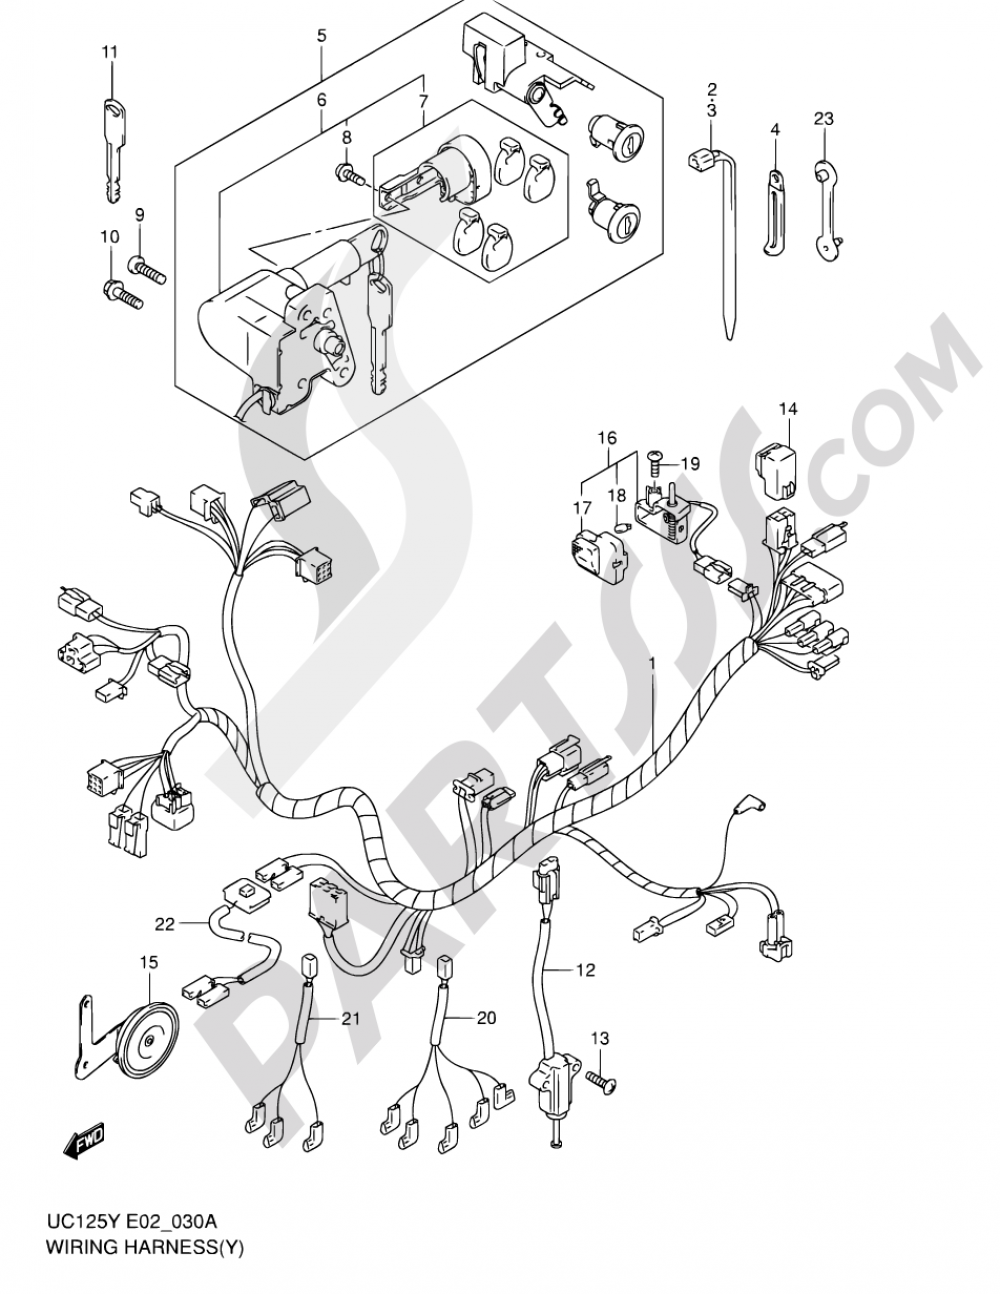 30A - WIRING HARNESS (MODEL Y/K1) Suzuki EPICURO UC125 2000 Model Wiring on